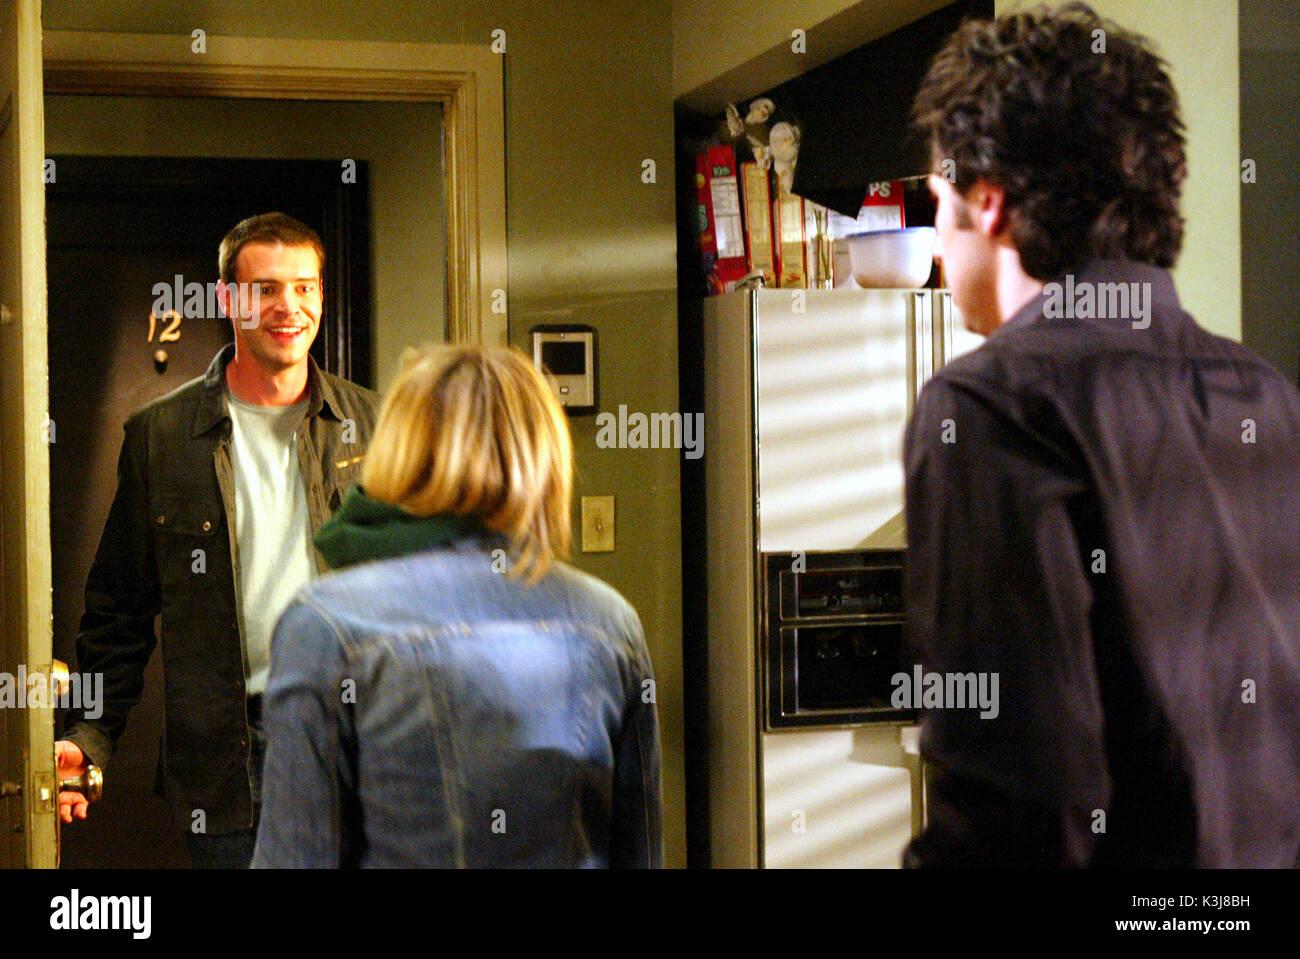 "100030_271 -- SCRUBS - The episode entitled, ""His Story II,"" airs on Tuesday, April 6 (9:30-10:00 p.m., ET), on NBC.   (TOUCHSTONE/MITCHELL HADDAD) SCOTT FOLEY, SARAH CHALKE, ZACH BRAFF SCRUBS [US TV SERIES 2001 -  ]  Series#3/Episode#18/""His Story II""  [L-R] SCOTT FOLEY as Sean,  SARAH CHALKE as Dr. Elliot Reid,  ZACH BRAFF as Dr. John 'J.D.' Dorian       100030_271 -- SCRUBS - The episode entitled, ""His Story II,"" airs on Tuesday, April 6 (9:30-10:00 p.m., ET), on NBC.   (TOUCHSTONE/MITCHELL HADDAD) SCOTT FOLEY, SARAH CHALKE, ZACH BRAFF - Stock Image"